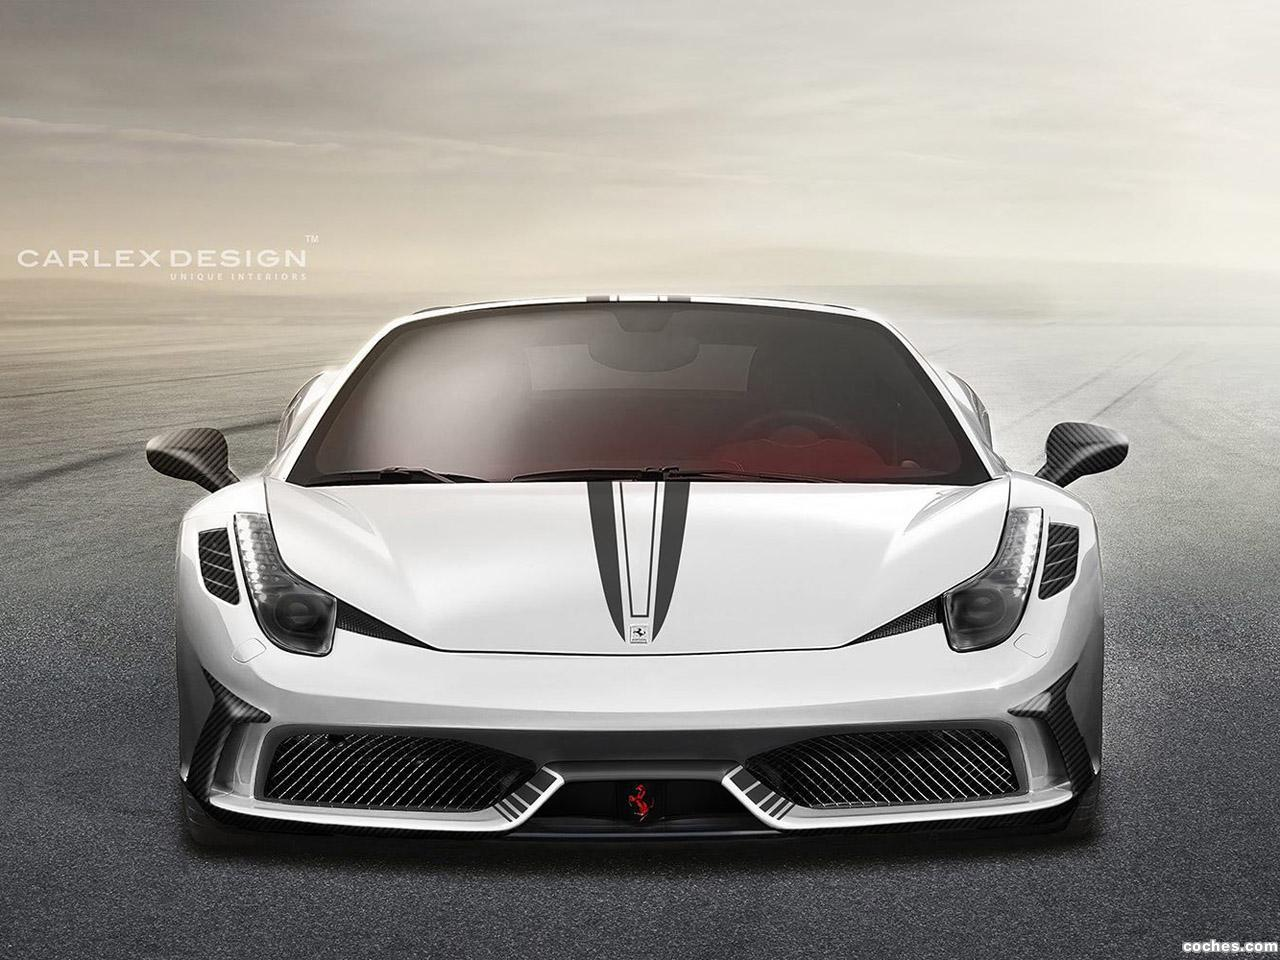 ferrari_458-spider-concept-by-carlex-design-2015_r5